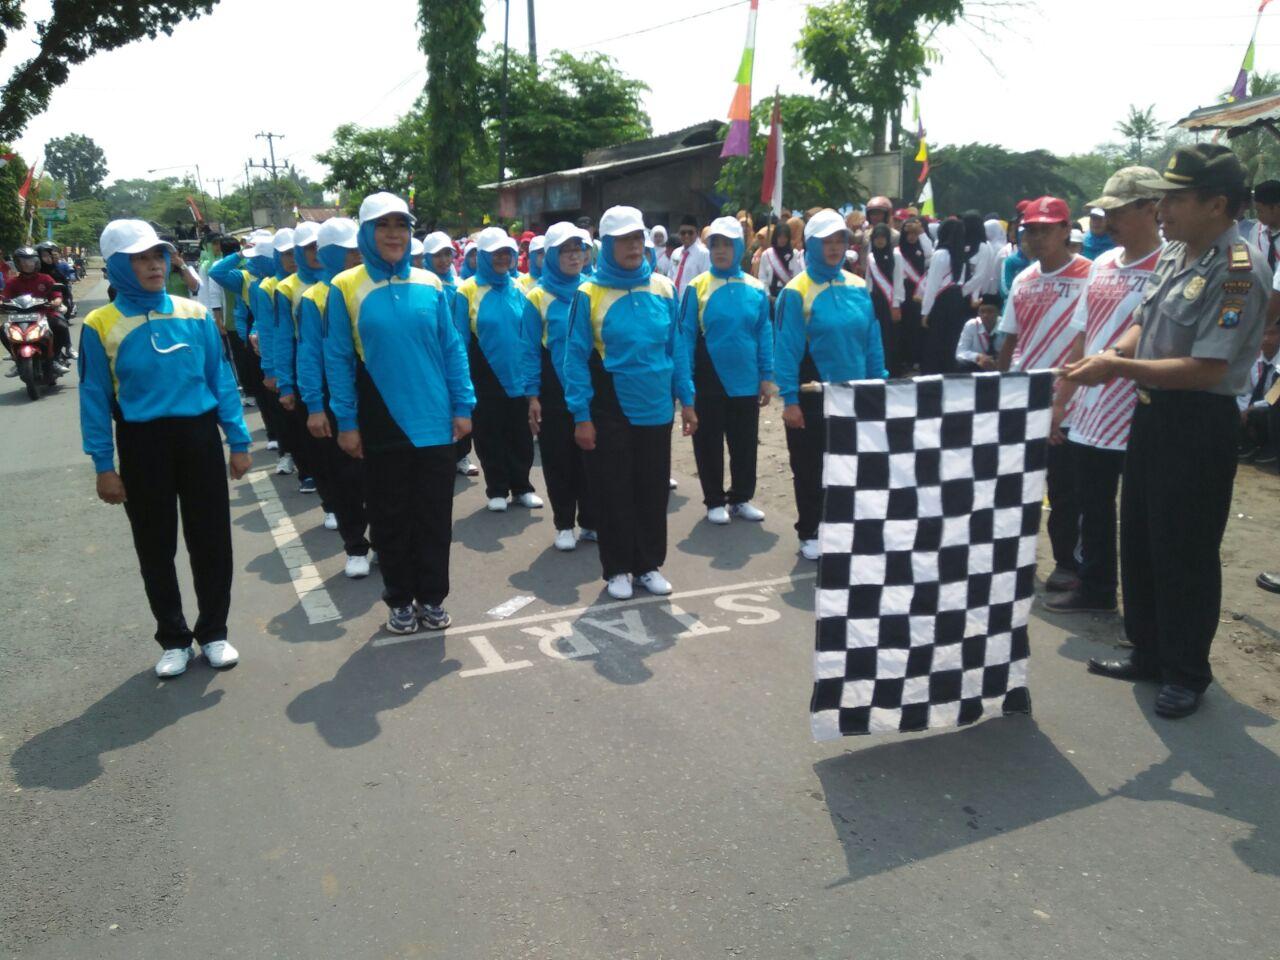 Kapolsek kasembon berangkatkan lomba gerak jalan wilayah Kasembon